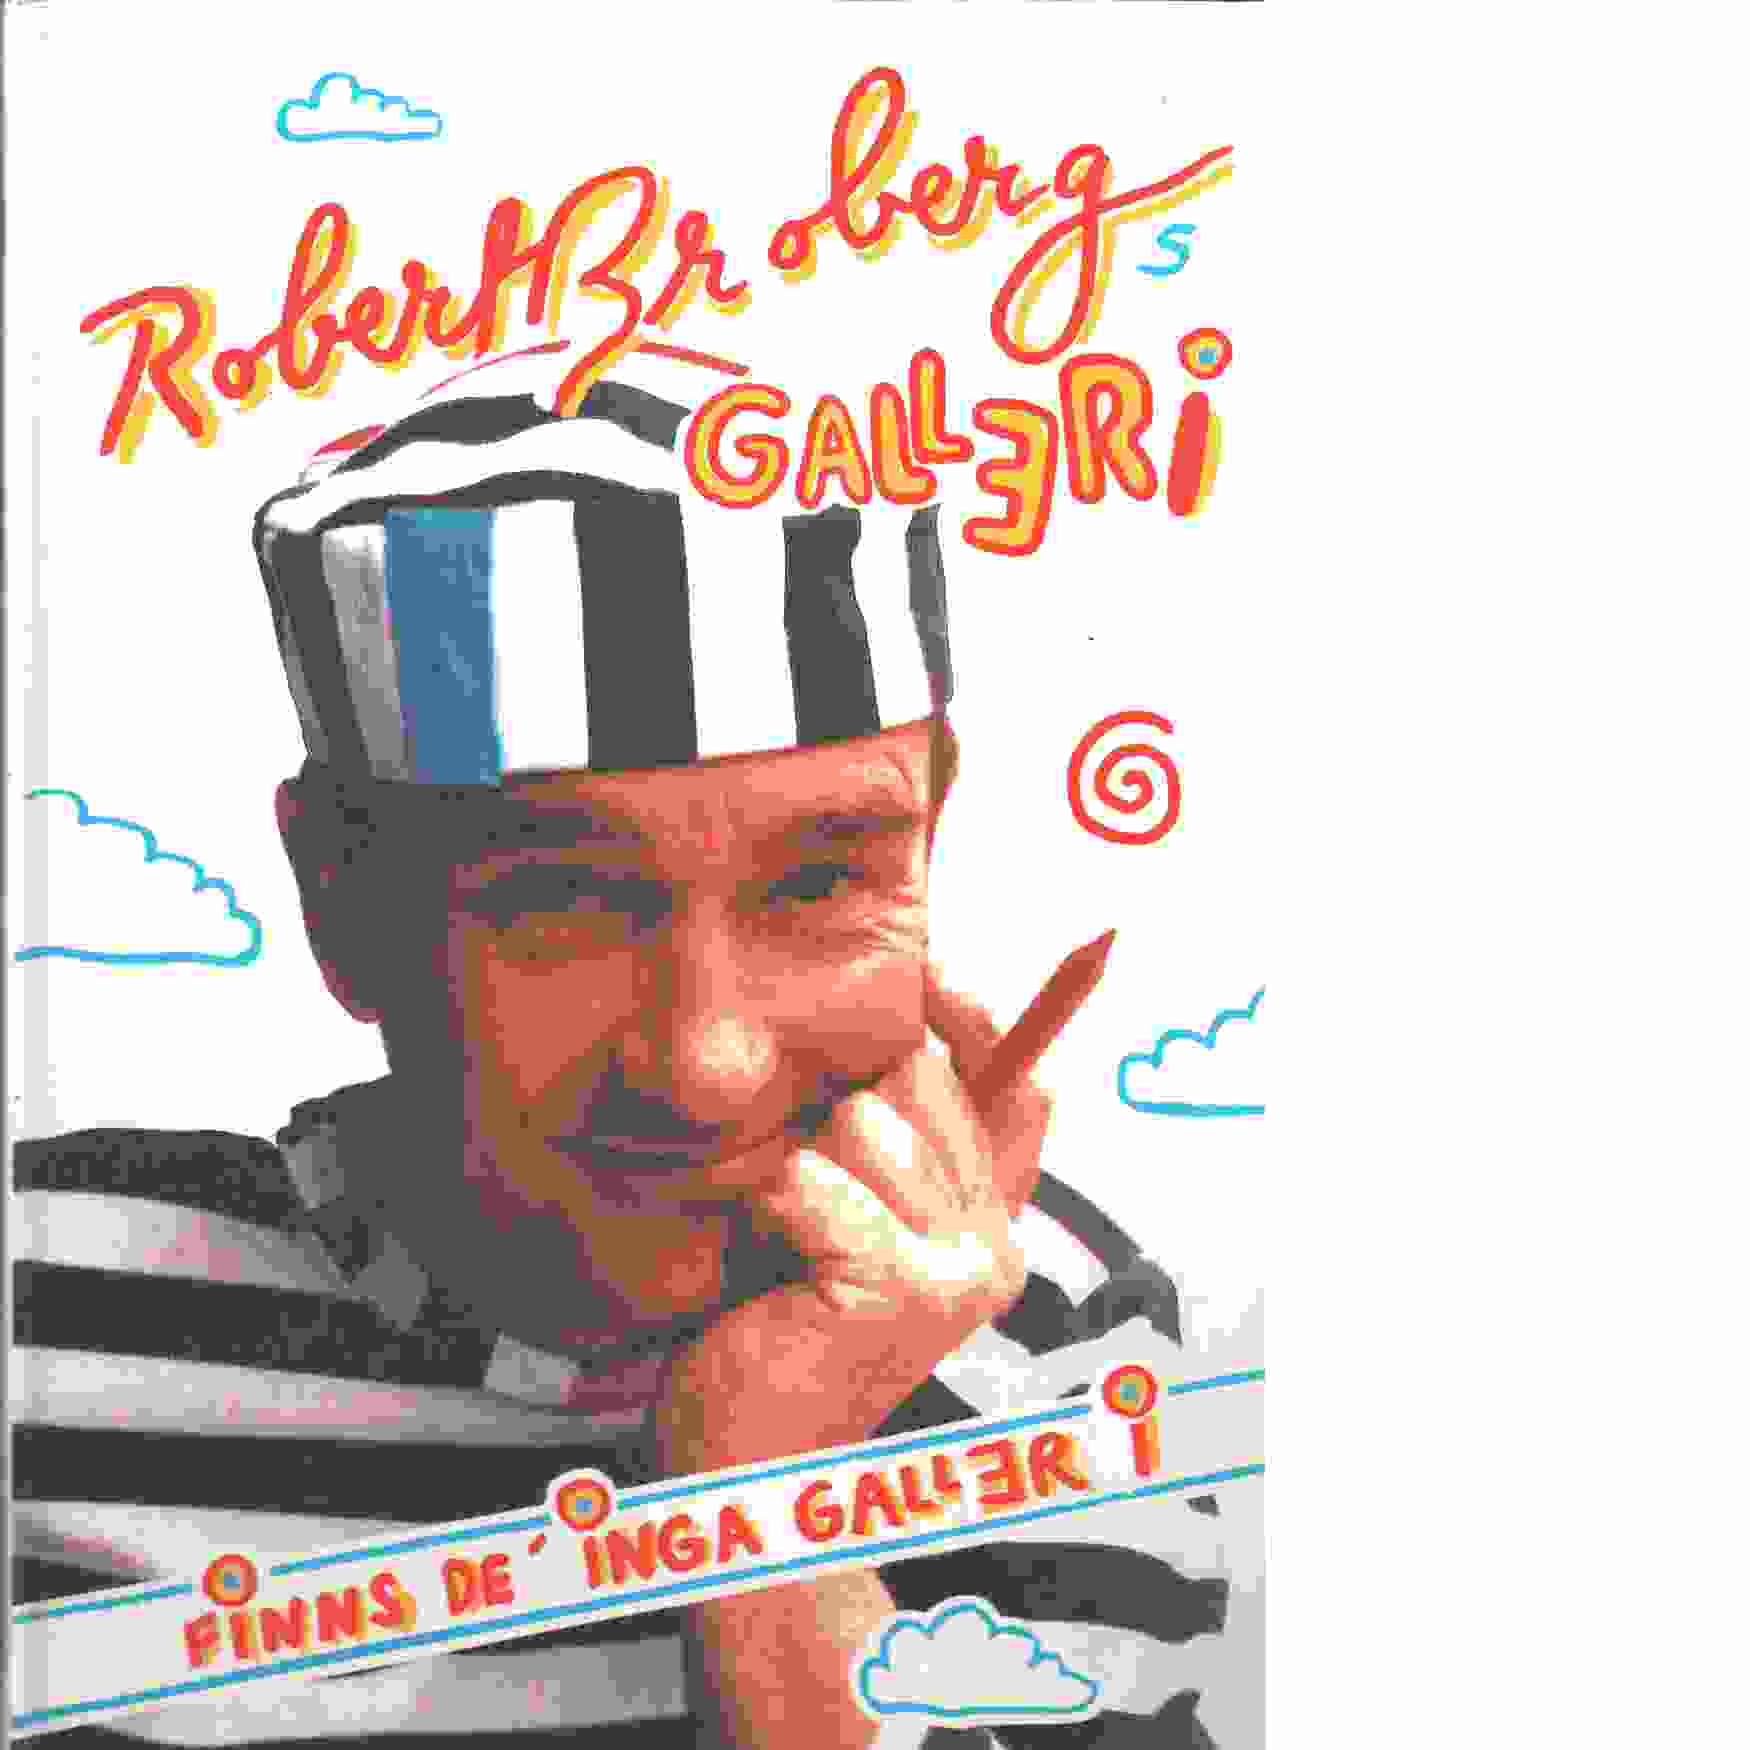 Robert Brobergs galleri finns de' inga galler i. - Broberg, Robert